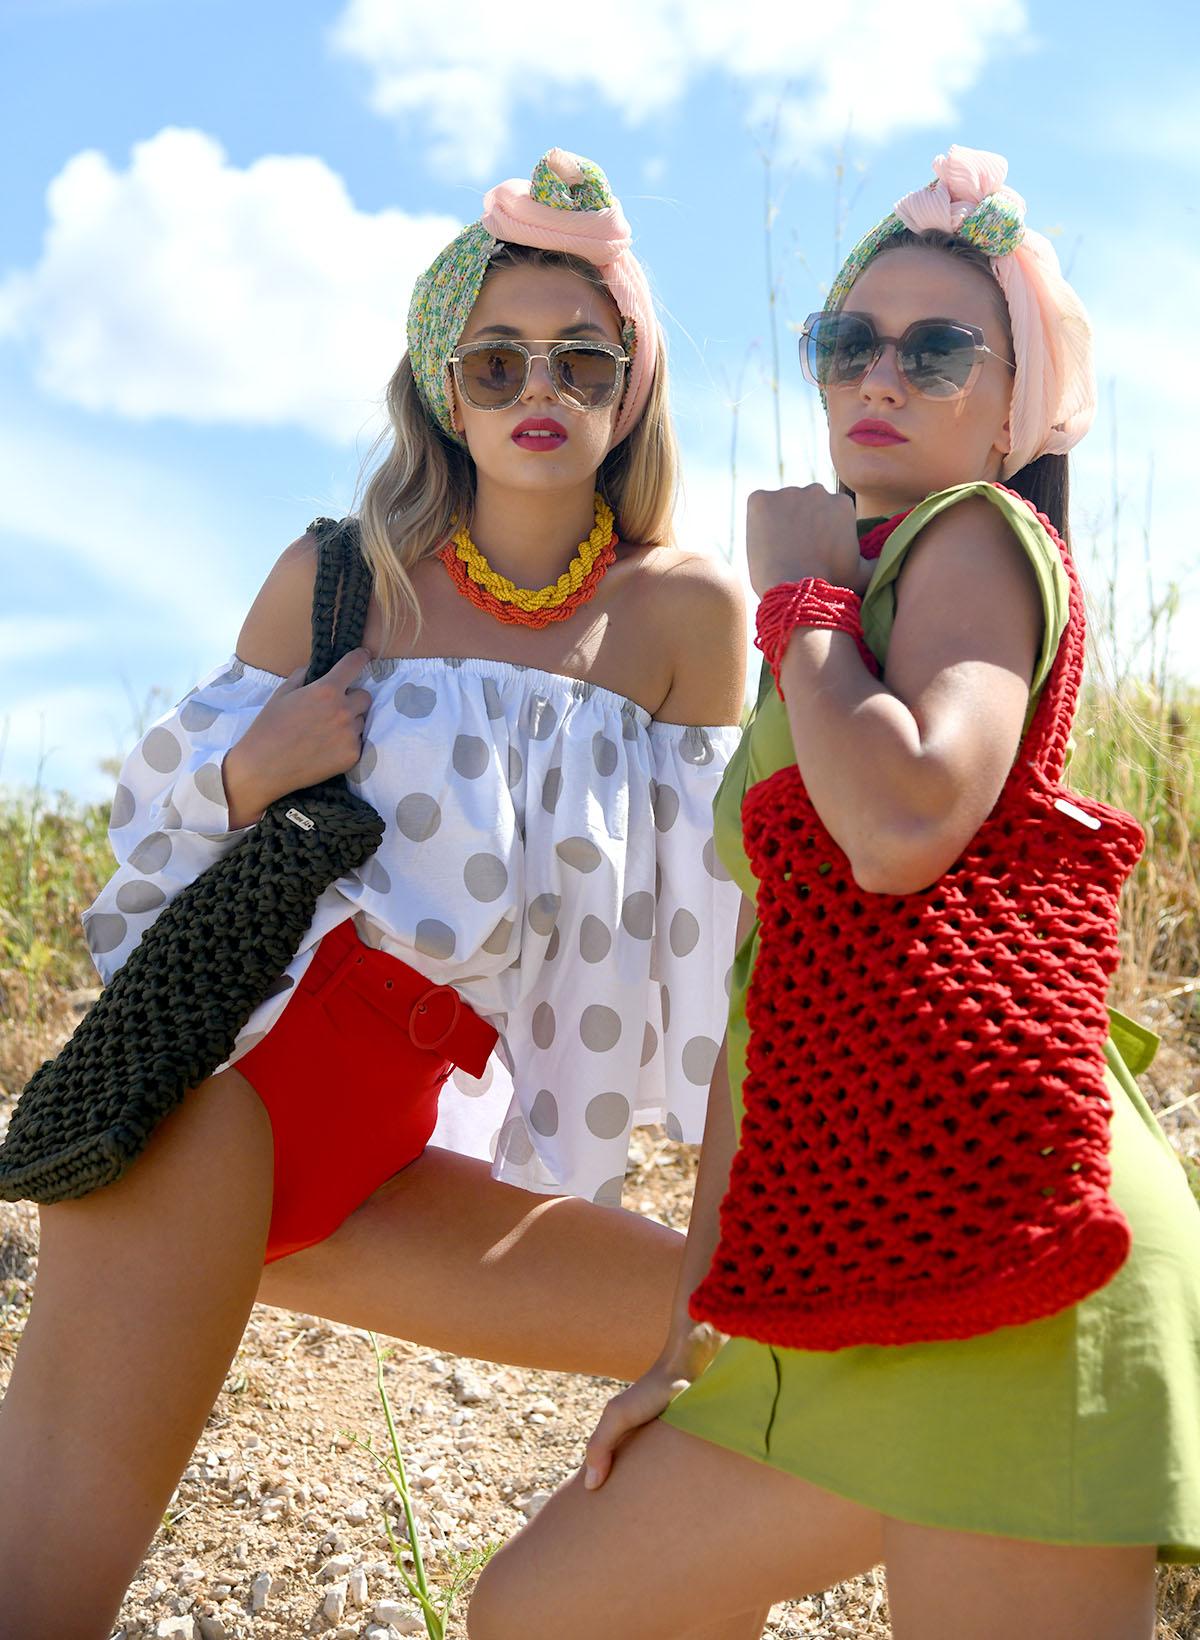 Extravagant editorials: Summer vibes